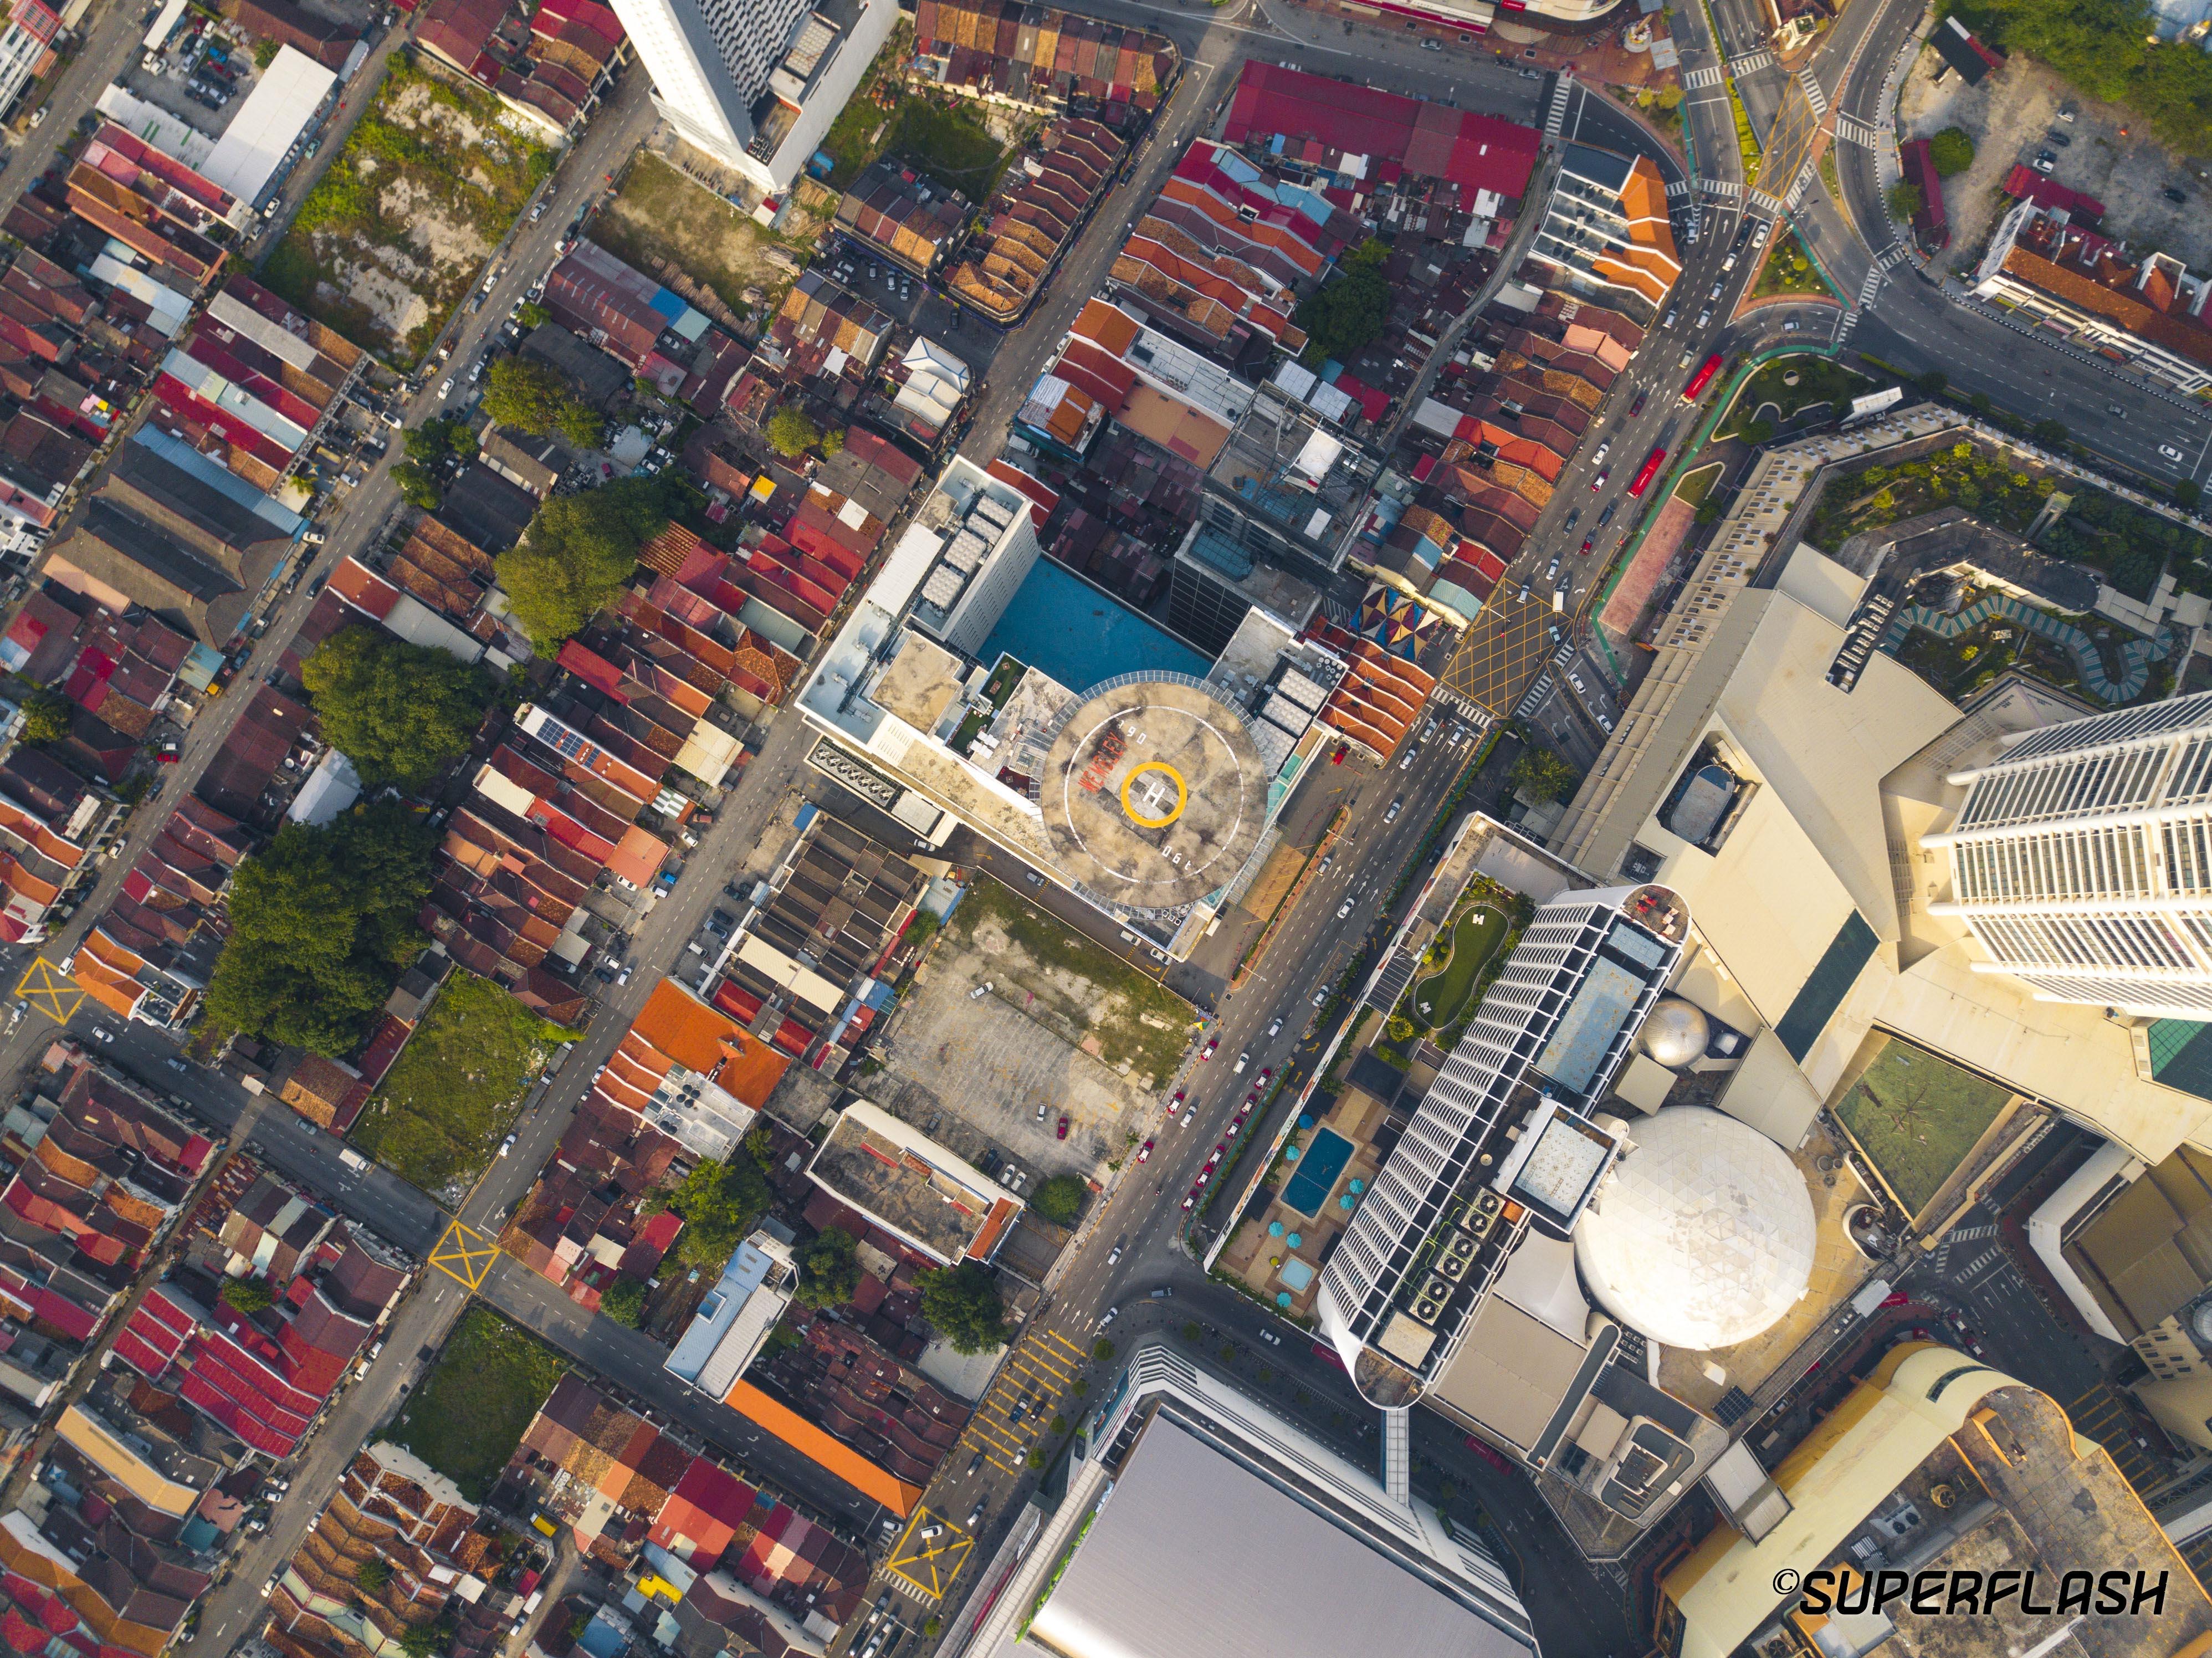 Town Center of Penang